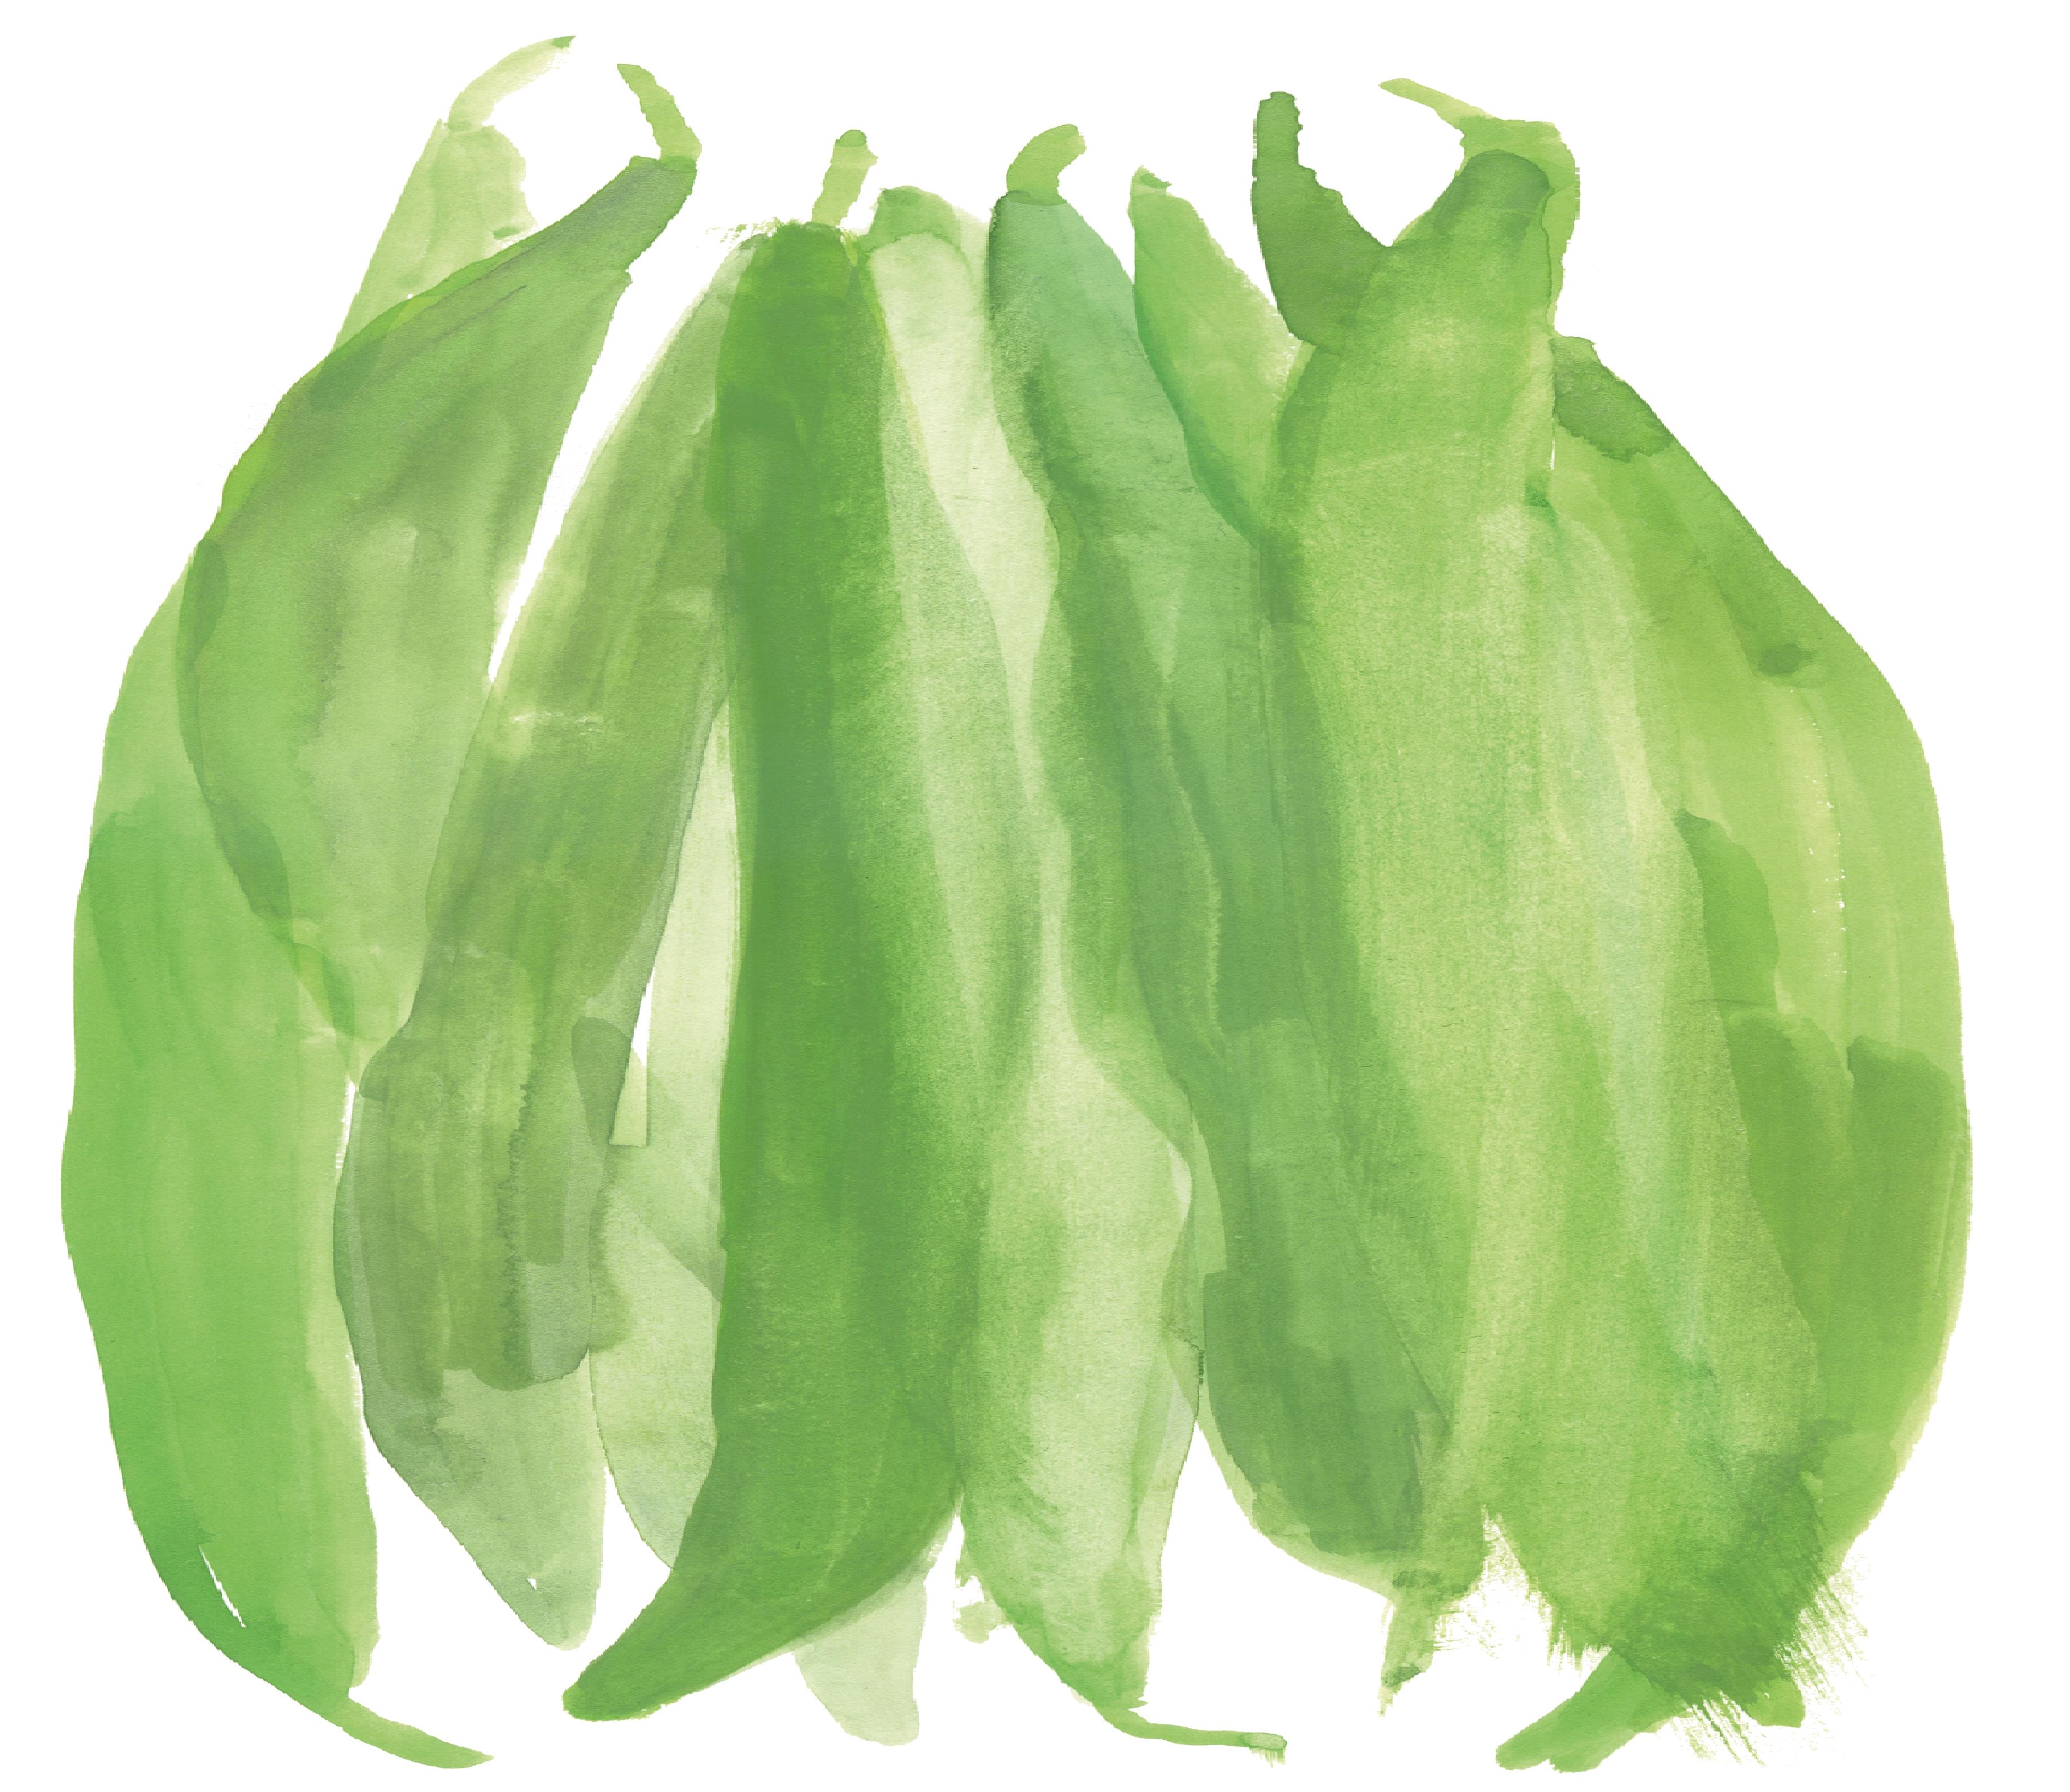 Hand drawn image of Sugar snap peas